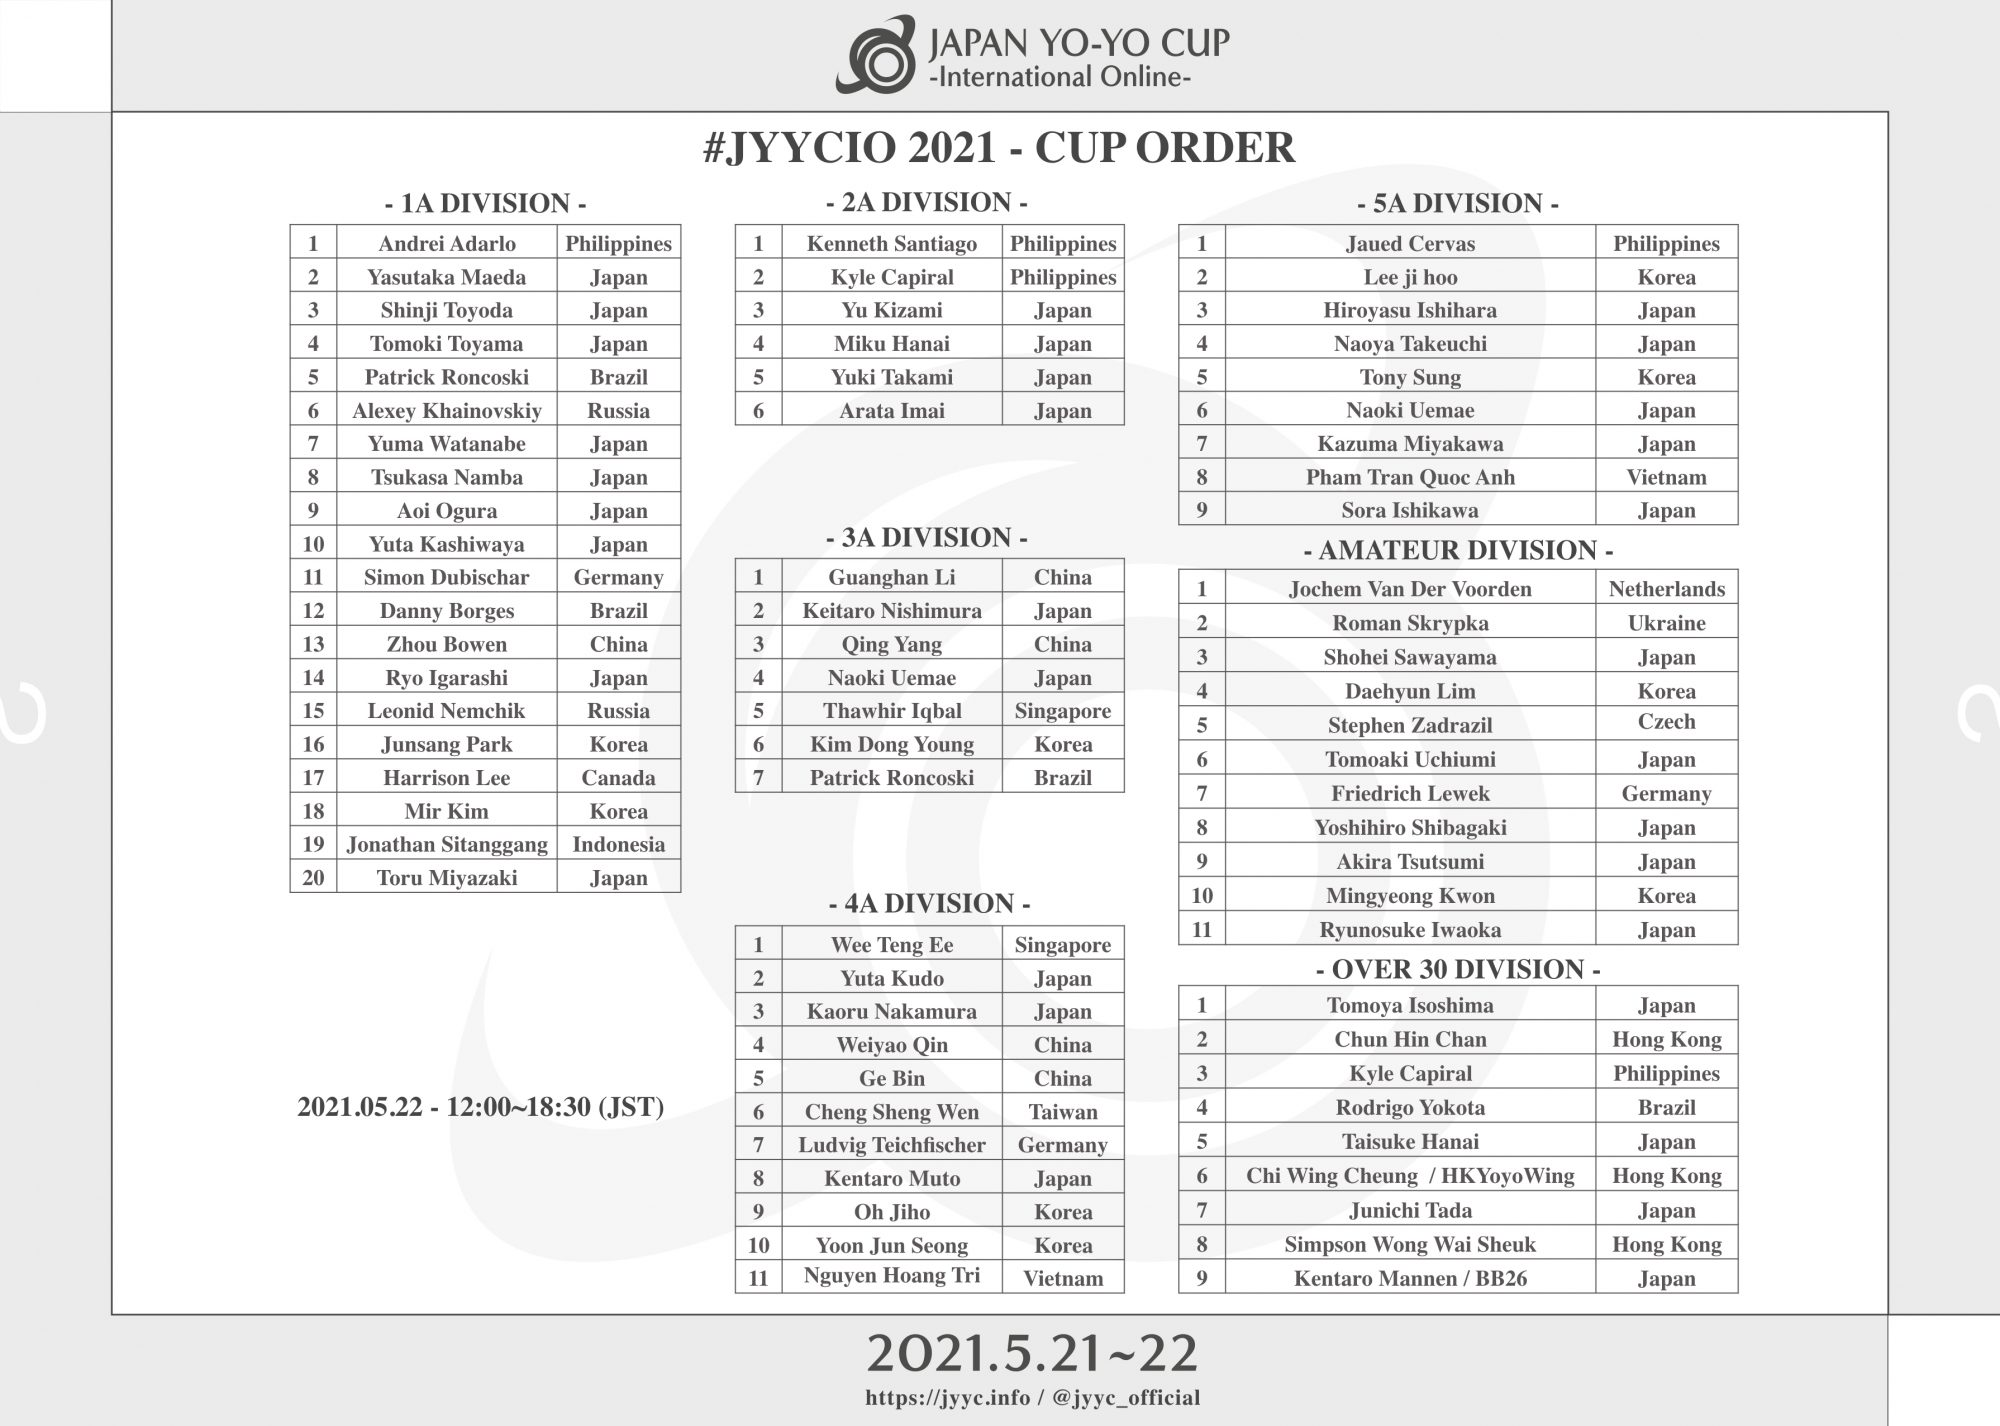 1A部門予選結果、決勝演技順を発表! / 1A Division preliminary results & final  order announced!